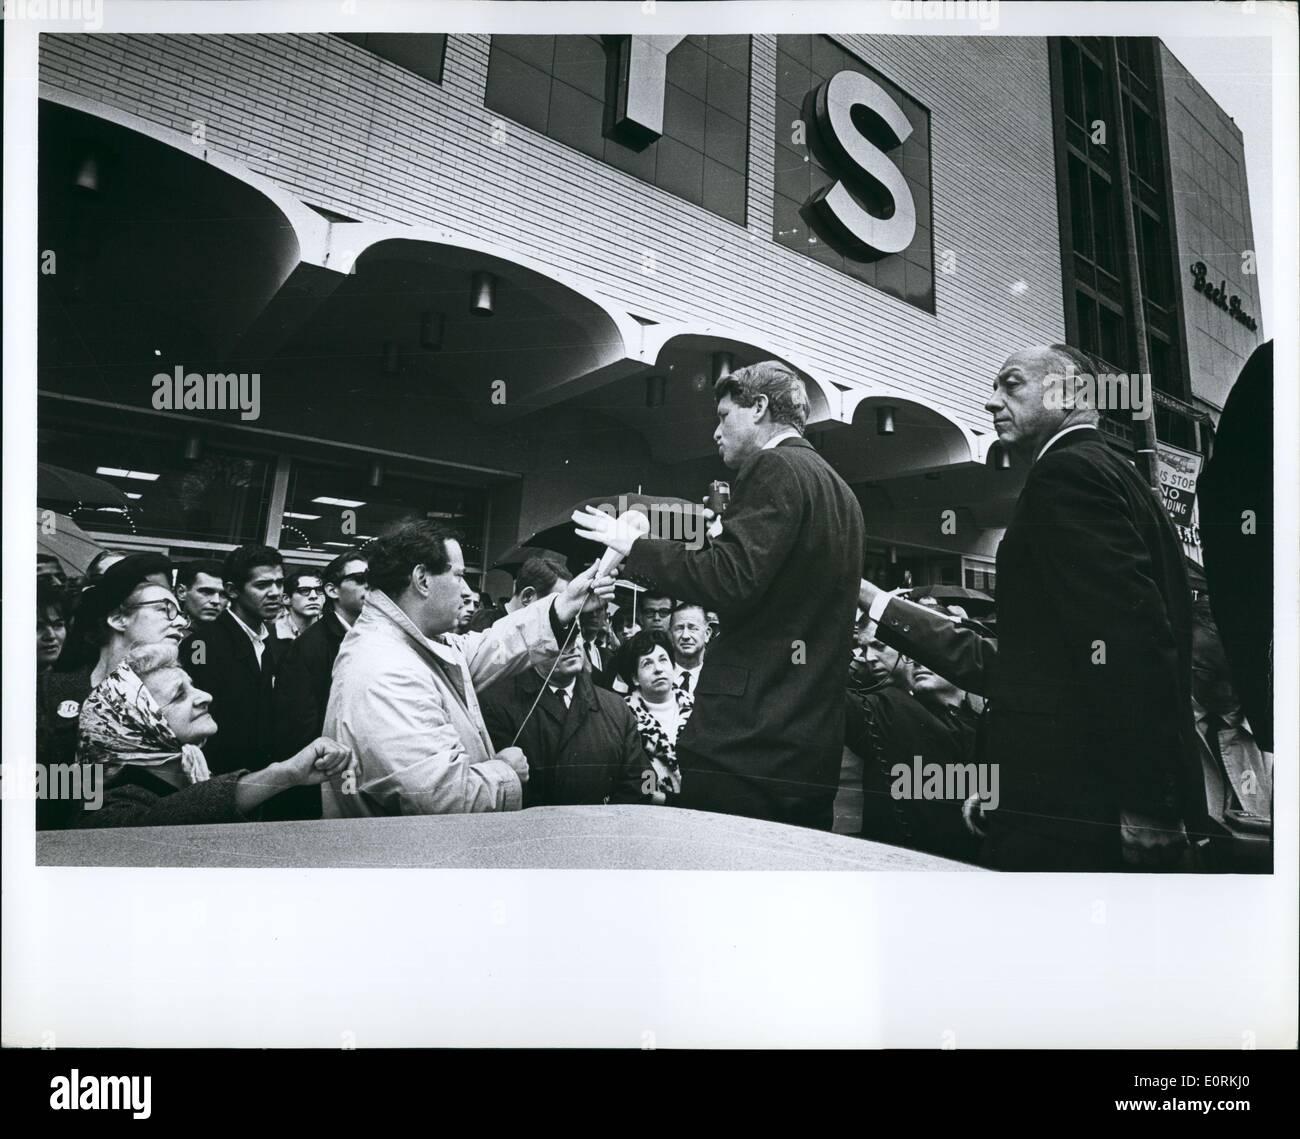 STORE NEW YORK ELECTION CAMPAIGN PHOTO POLITICS 1964 ROBERT KENNEDY MACY/'S DEPT